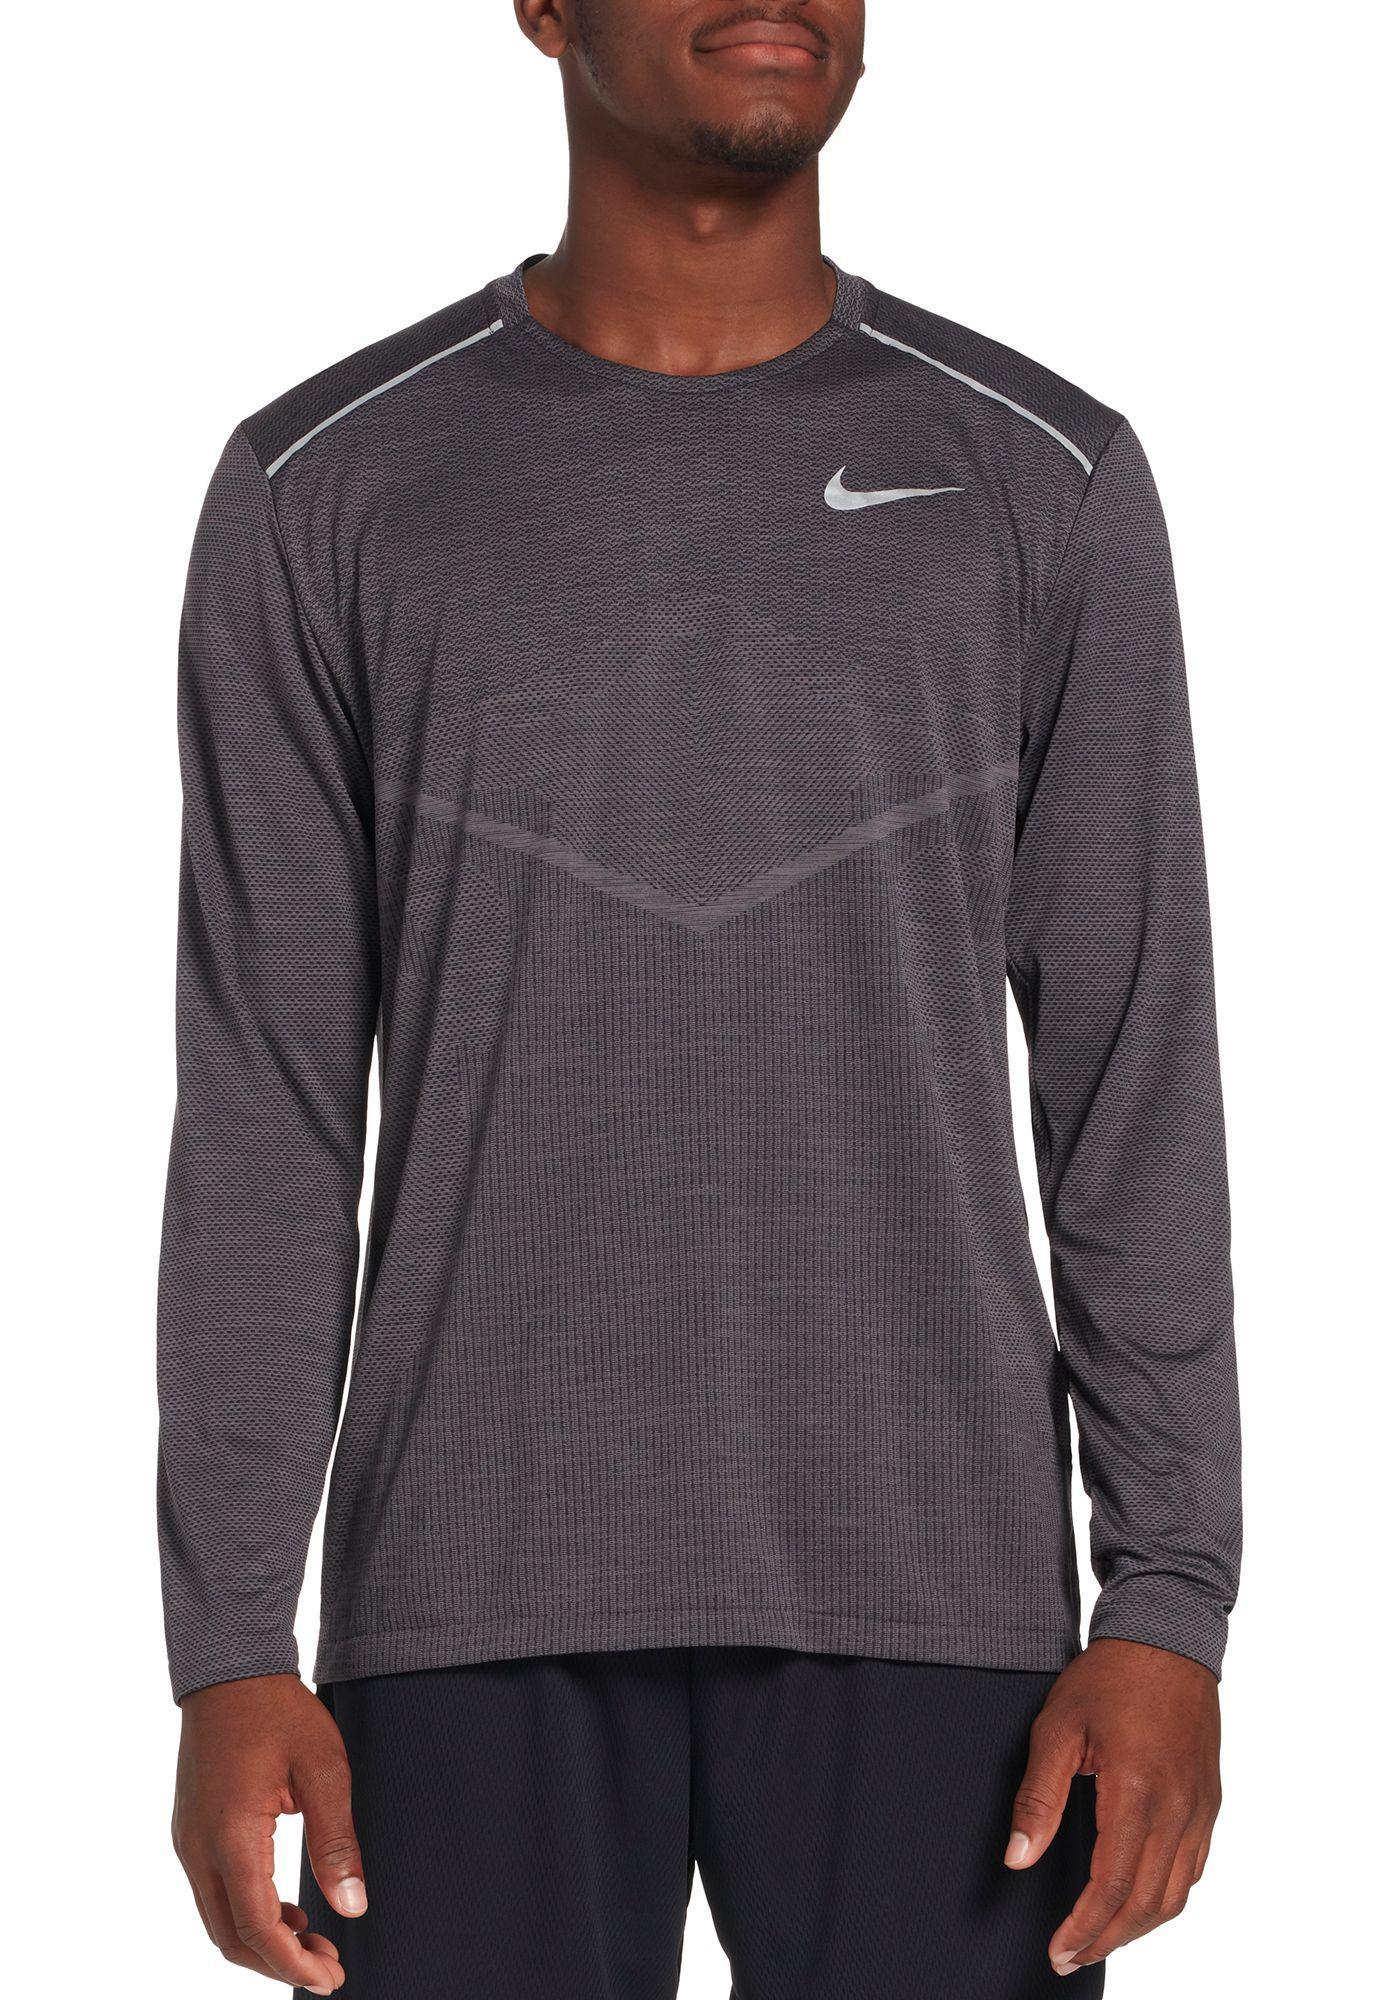 Nike Men's TechKnit Ultra Running Long Sleeve Shirt